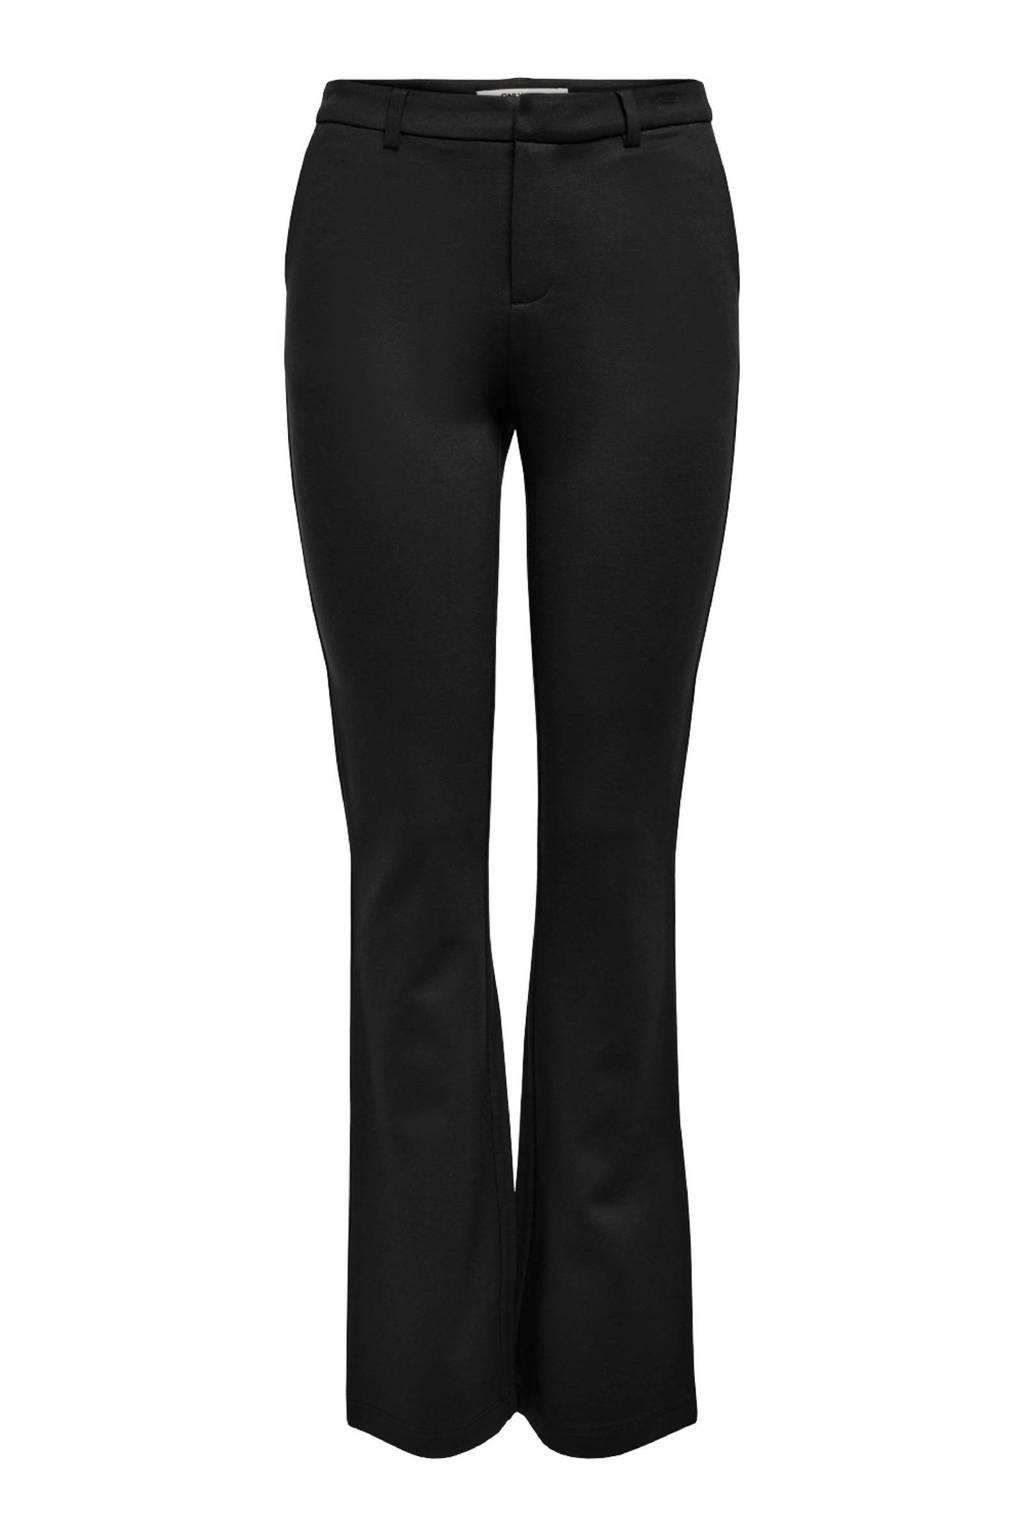 ONLY flared broek ONLELORA zwart, Zwart